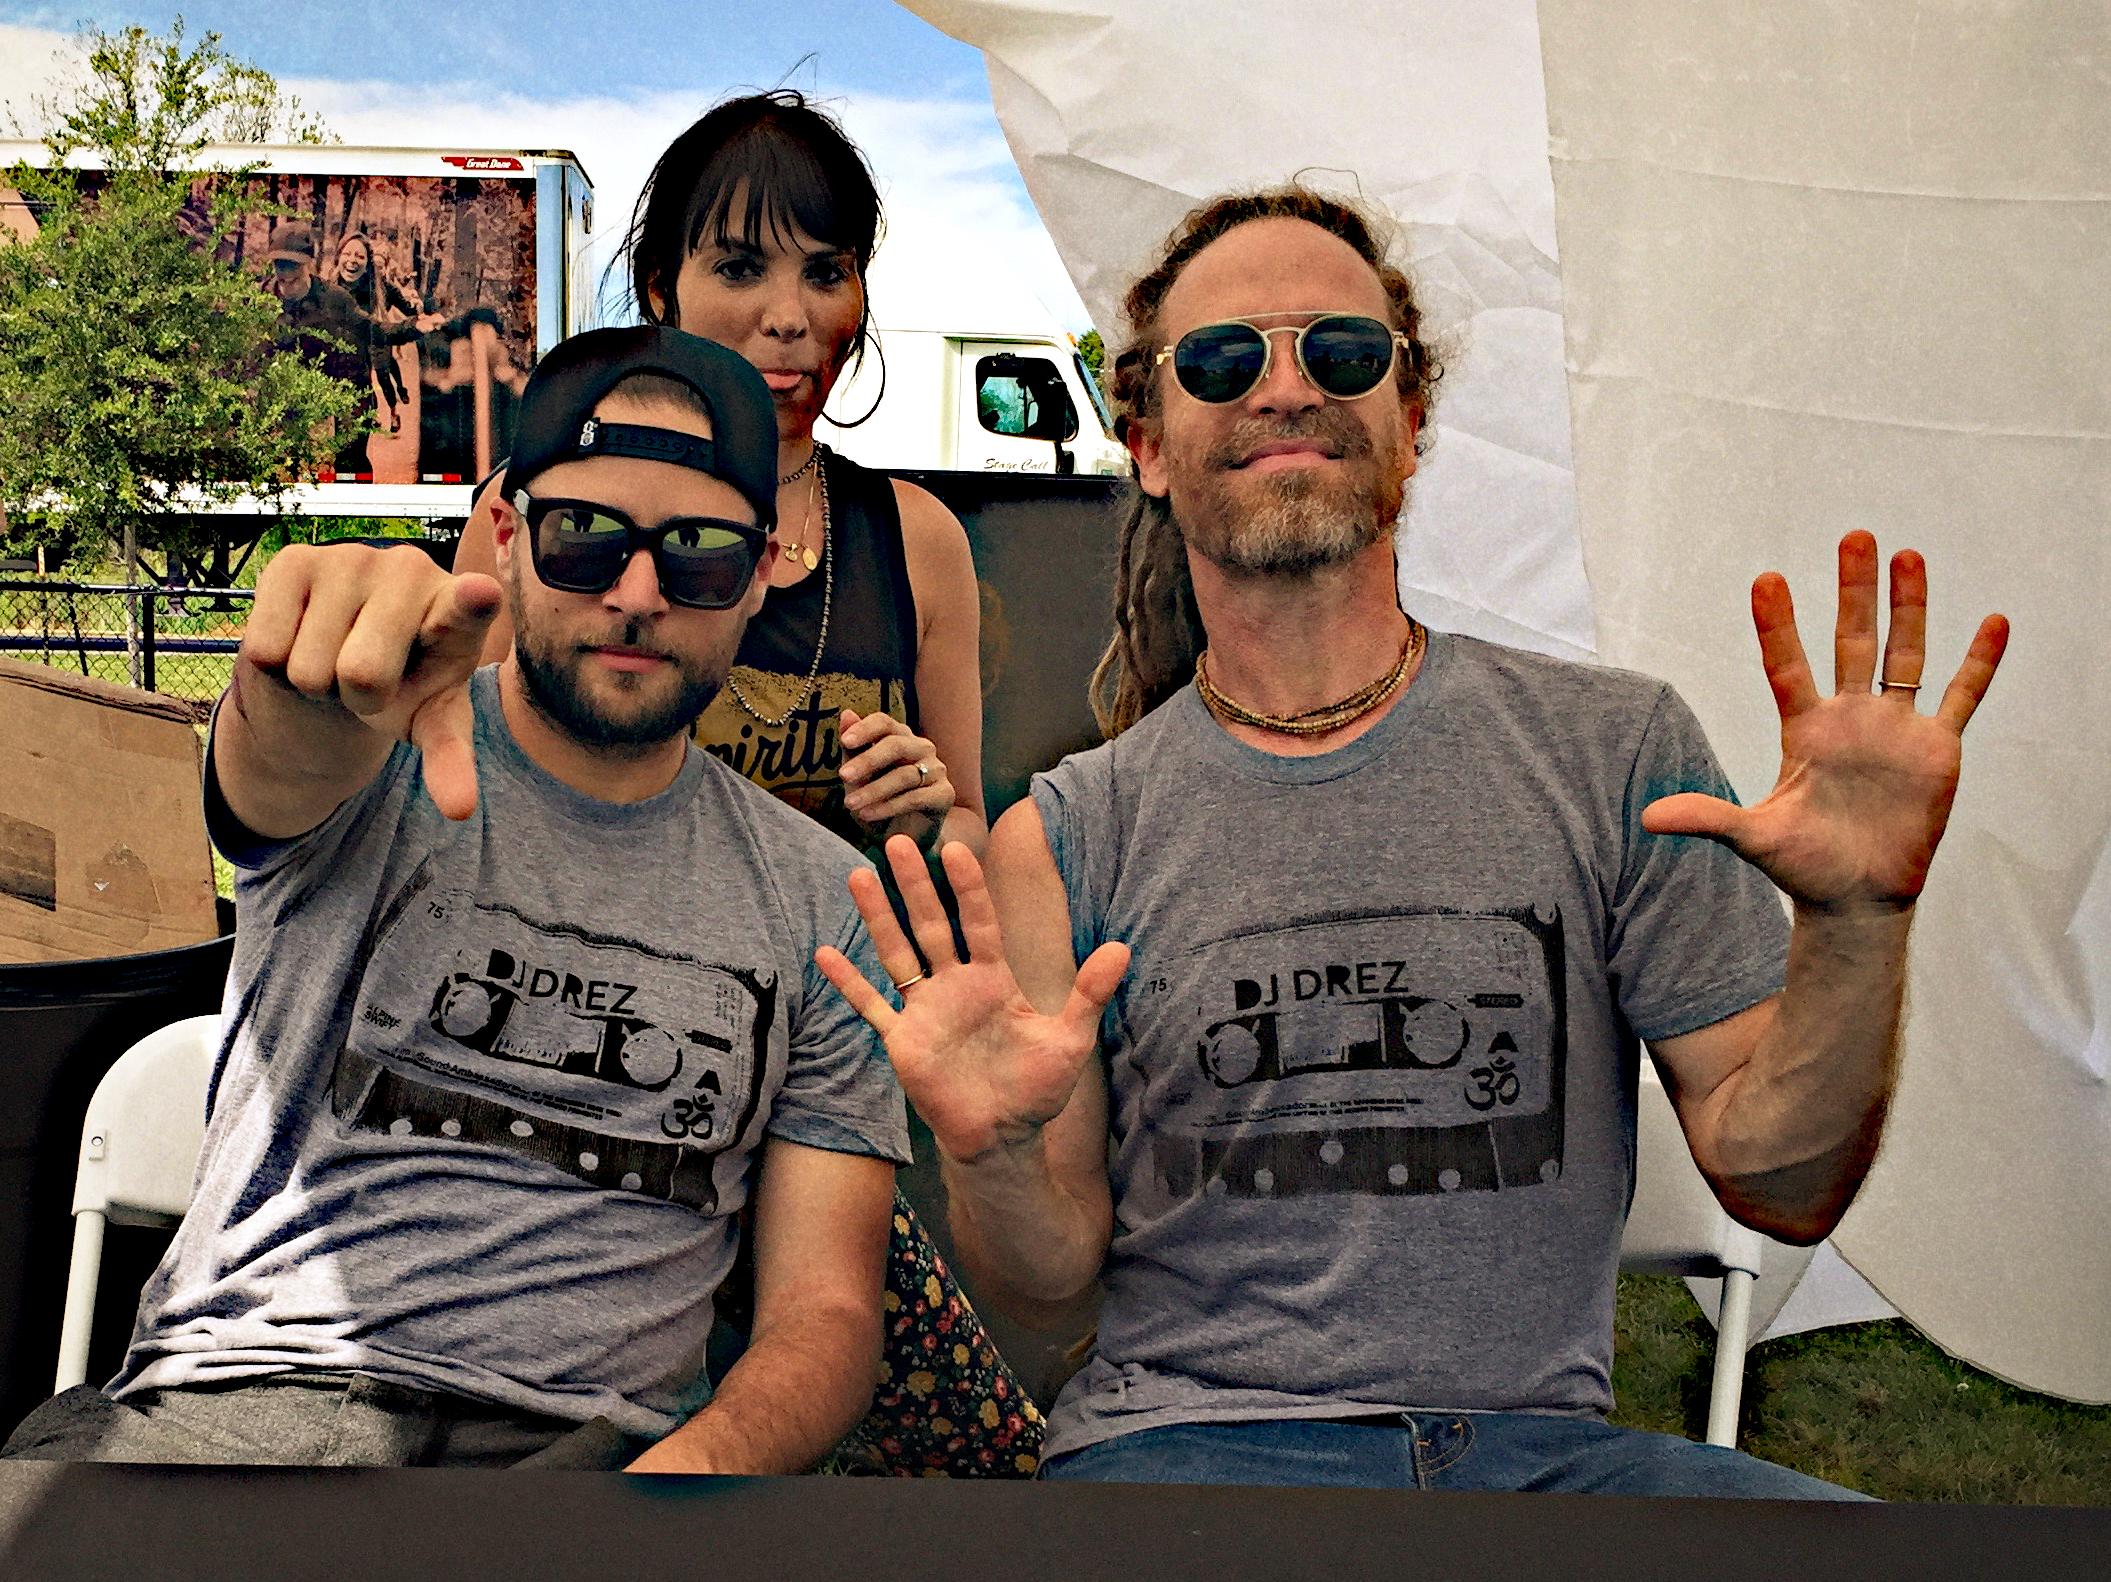 DJ Drez Grey Mixtape T Shirt ---->   BUY HERE